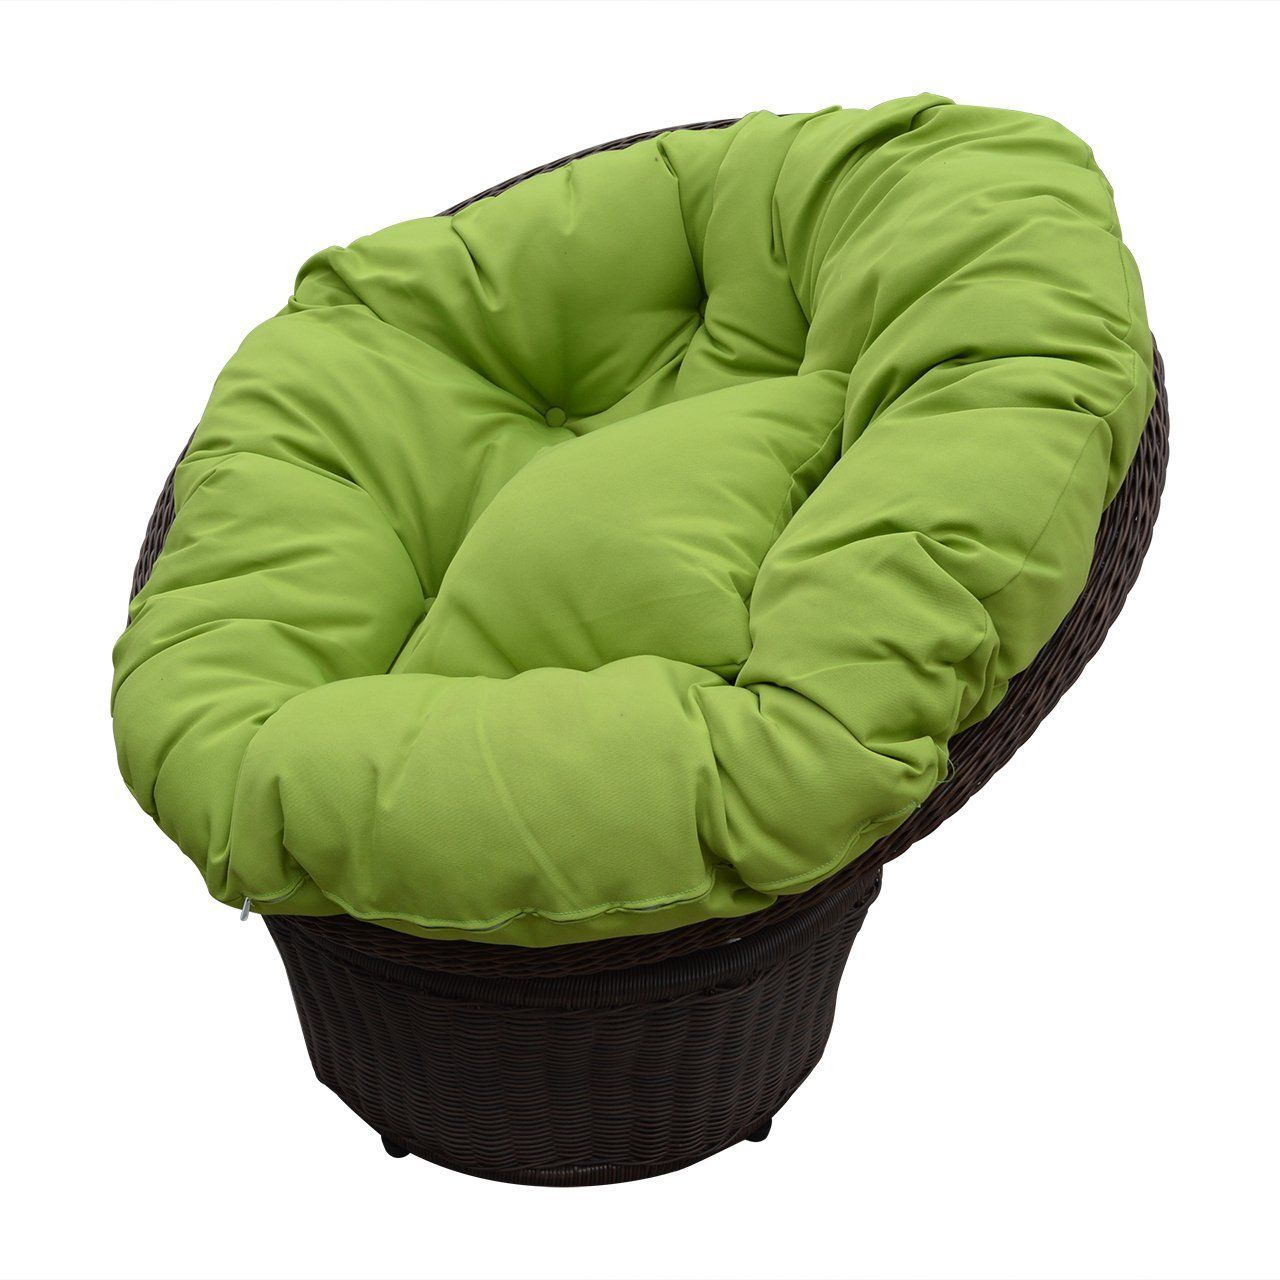 Handmade Rattan Wicker Swivel Rocking Round Chair With Cushion (Green):  Amazon.ca: Patio, Lawn U0026 Garden